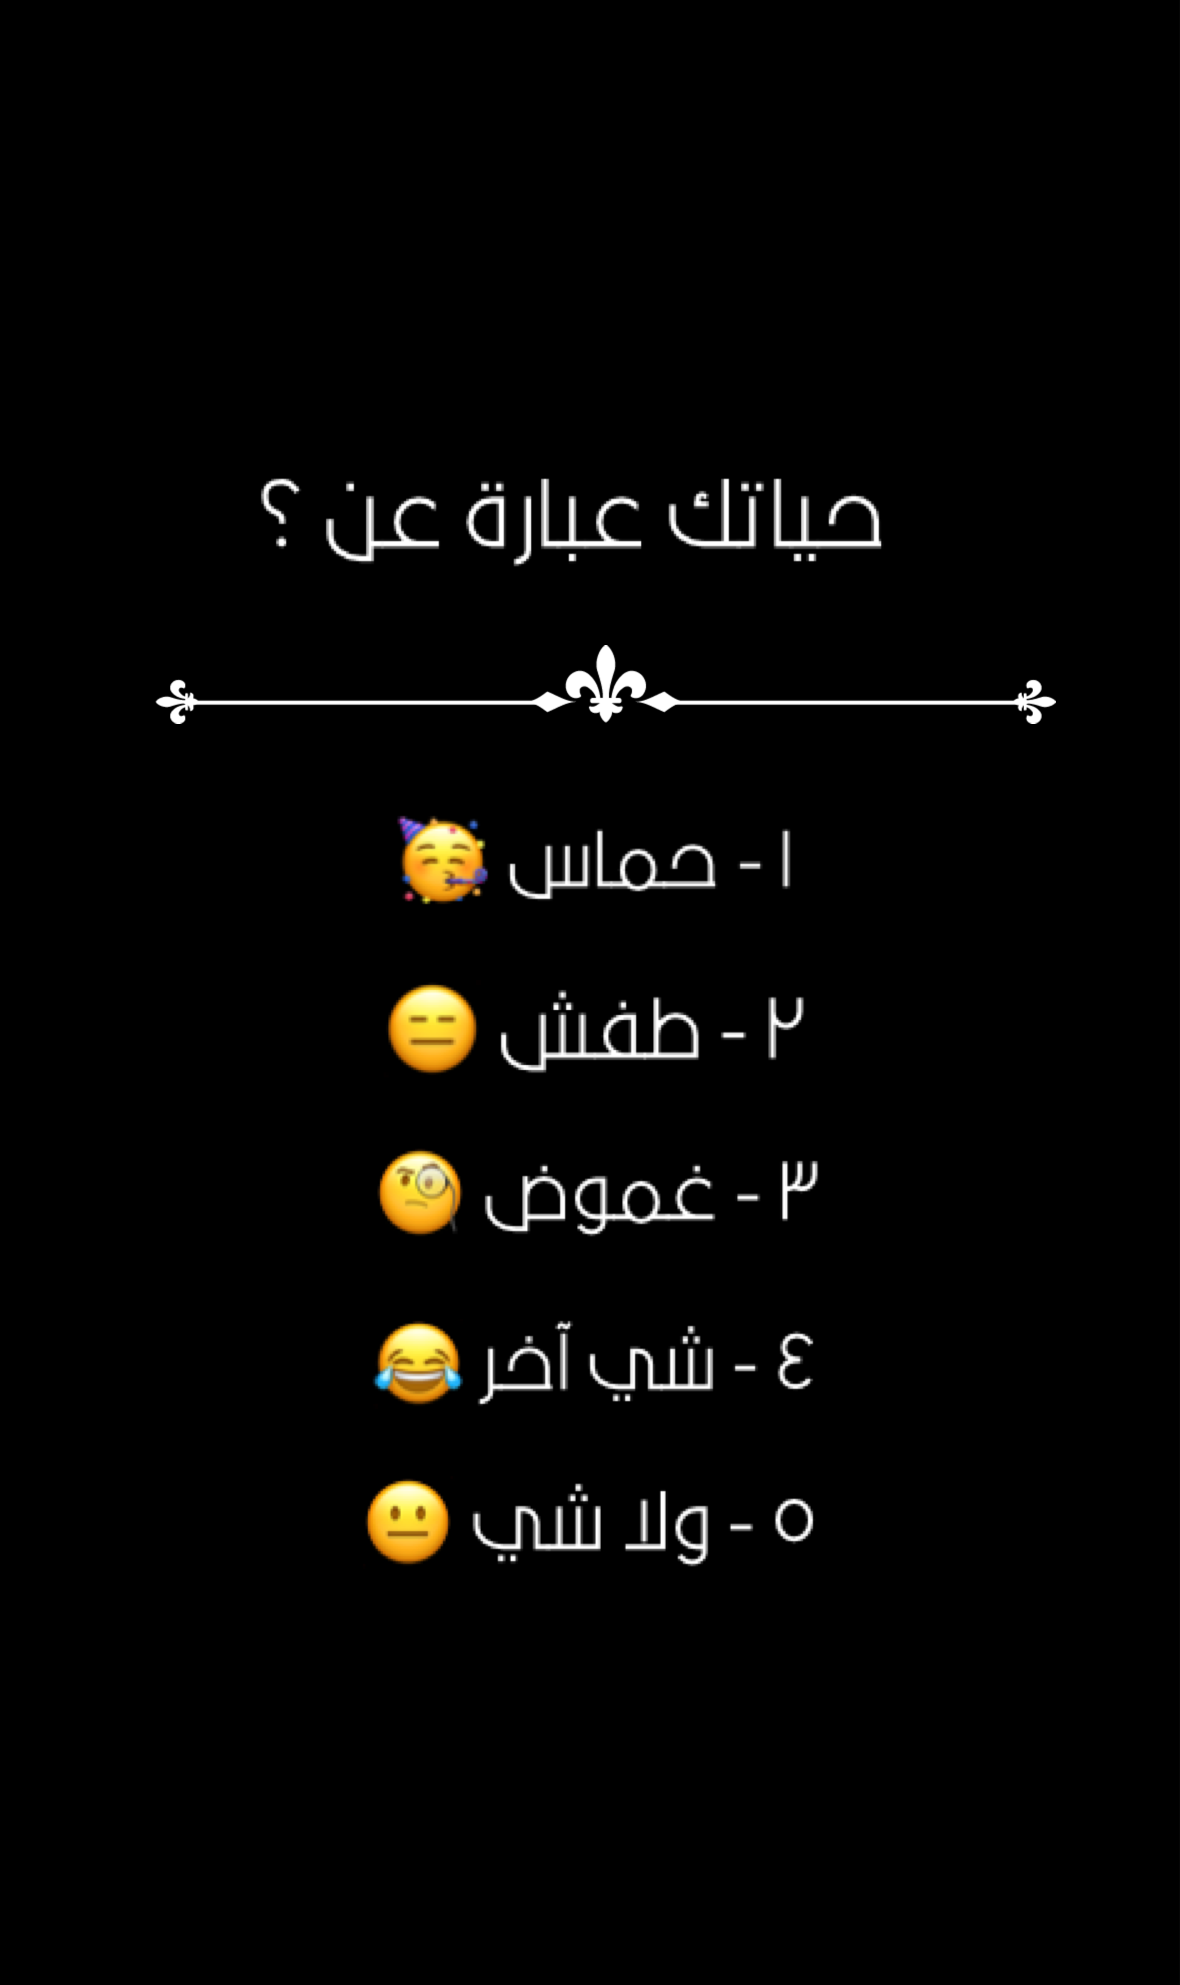 Pin By Israa Sayl On اسئلة و فعاليات Funny Arabic Quotes Art Wallpaper Arabic Quotes